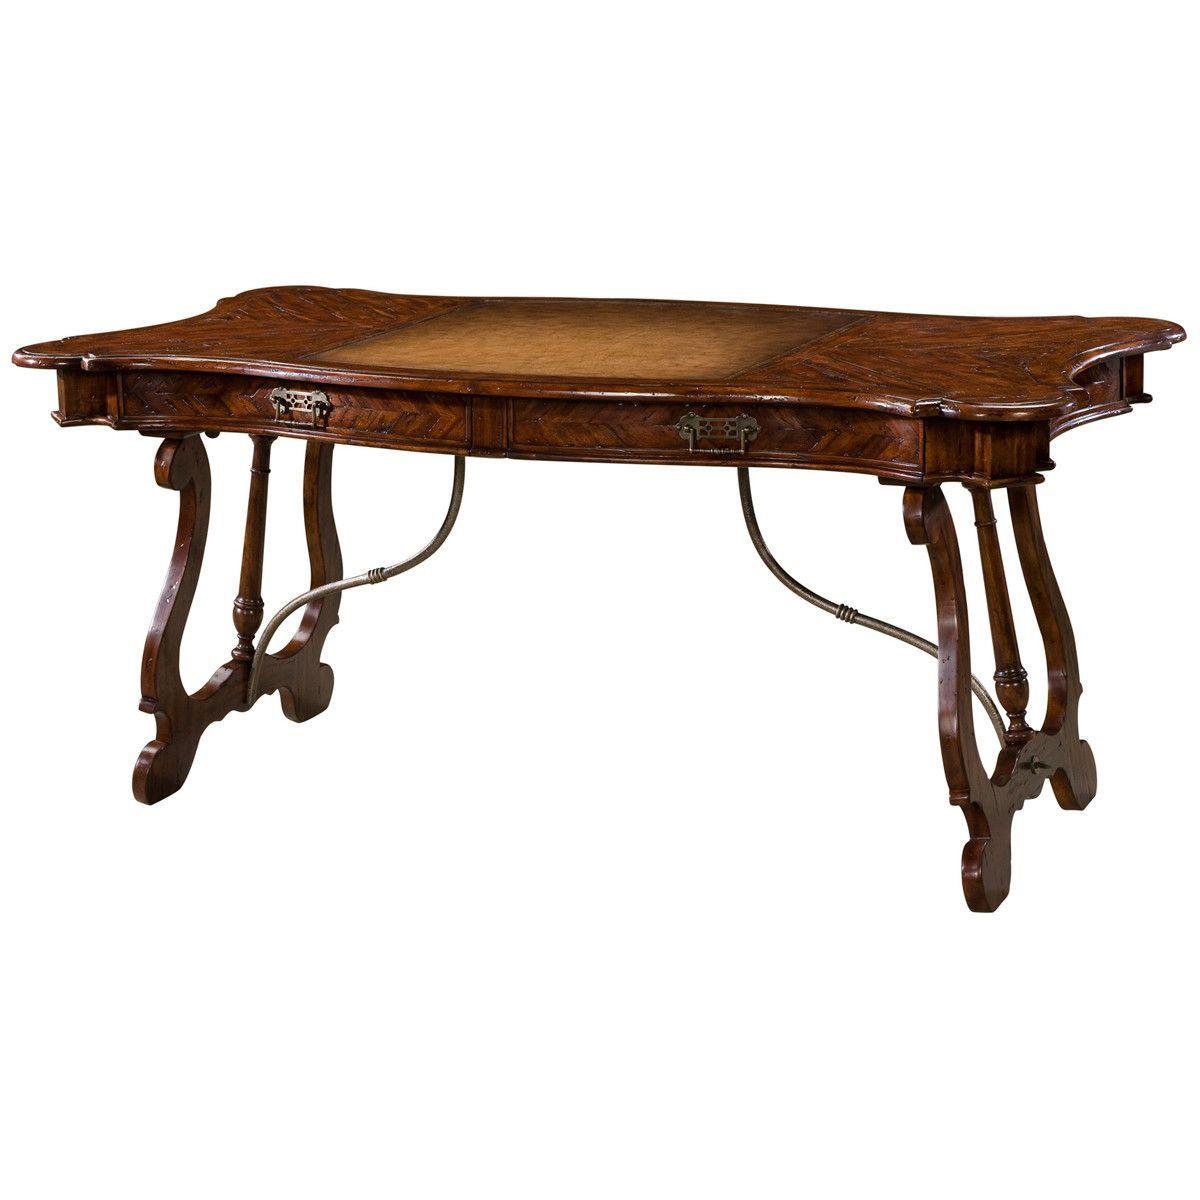 Theodore Alexander Castle Bromwich Bragança Writing Table